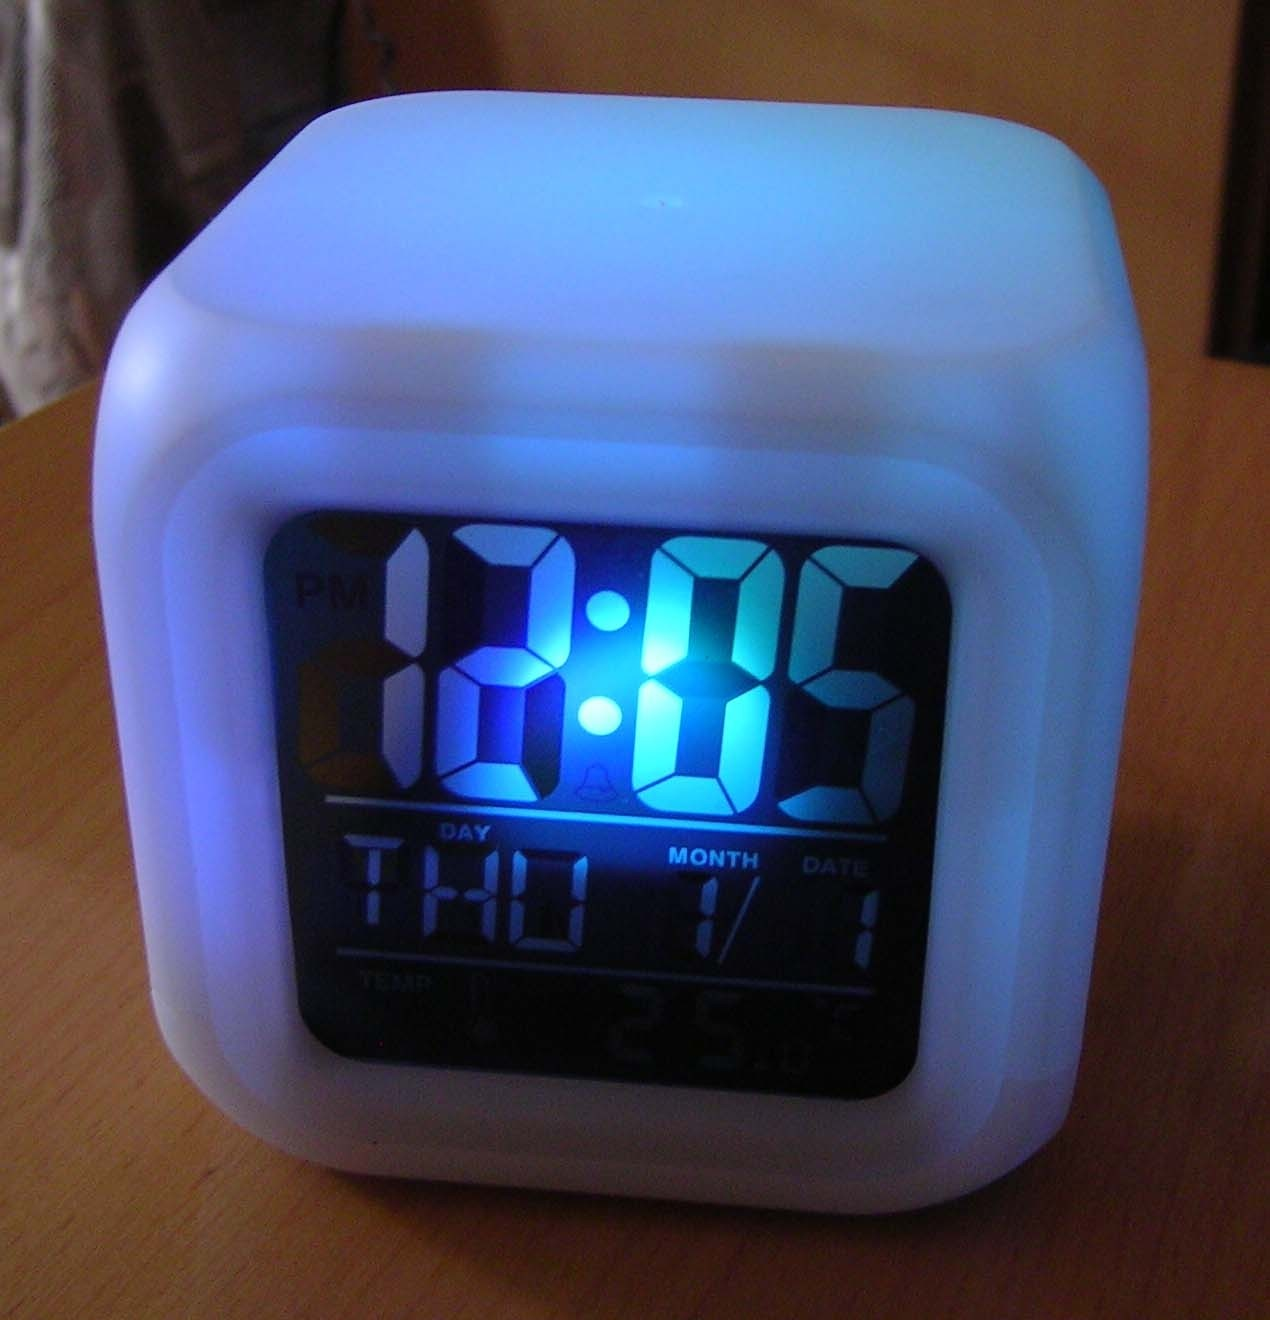 Horloge salle de bain digitale for Deco chambre bebe gara c2 a7on taupe et bleu